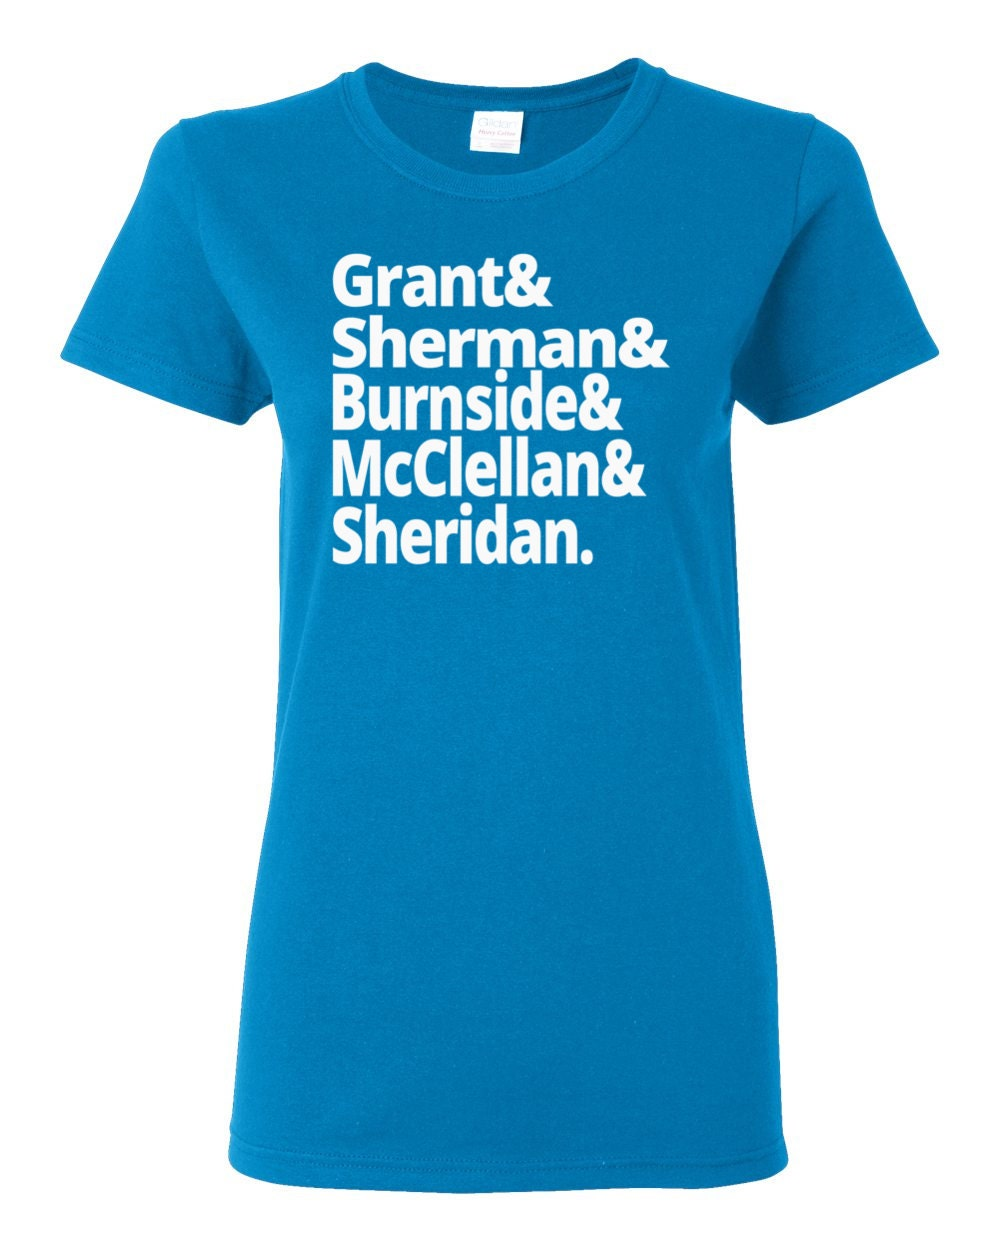 US Civil War - Union Generals - Grant, Sherman, Burnside, McClellan, Sheridan - Women's US Civil War History T-shirt